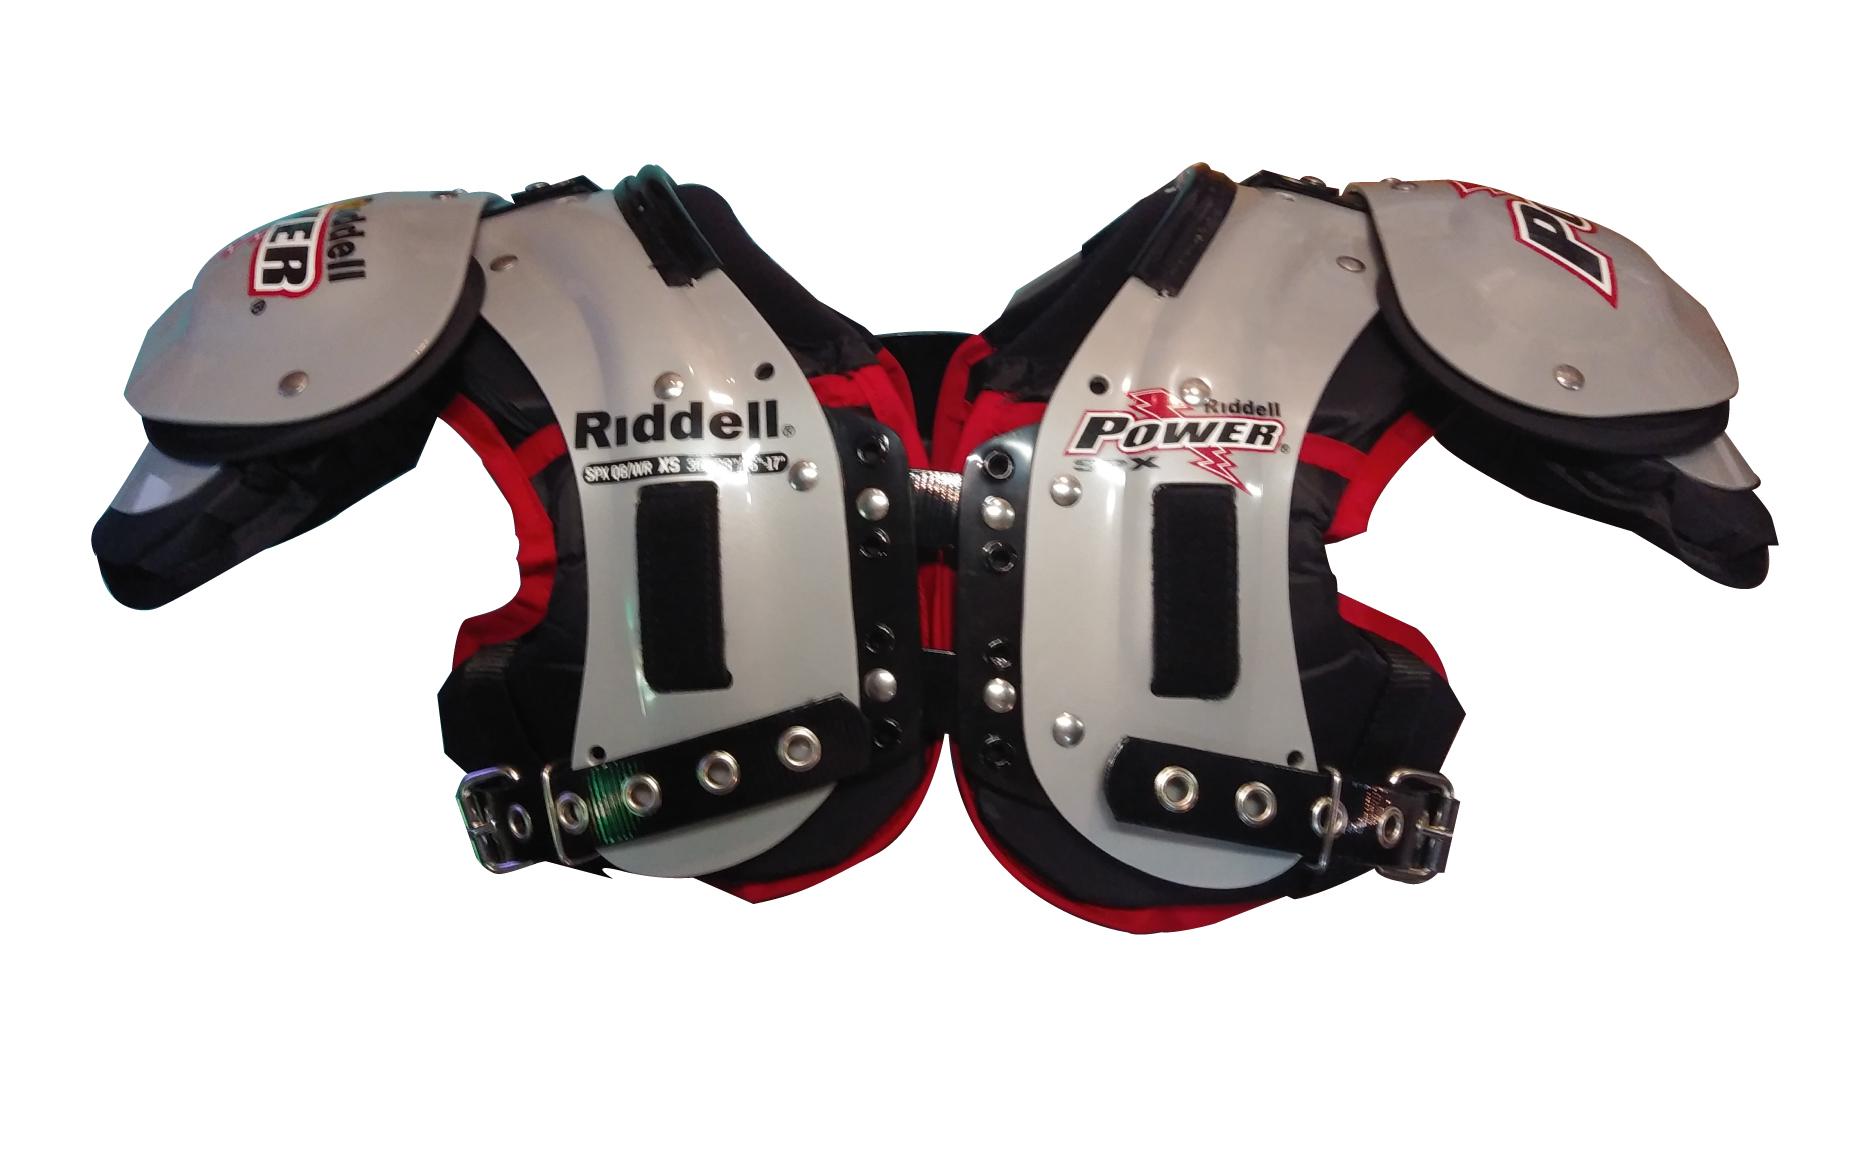 RIDDELL リデル パワー SPX ショルダーパッド